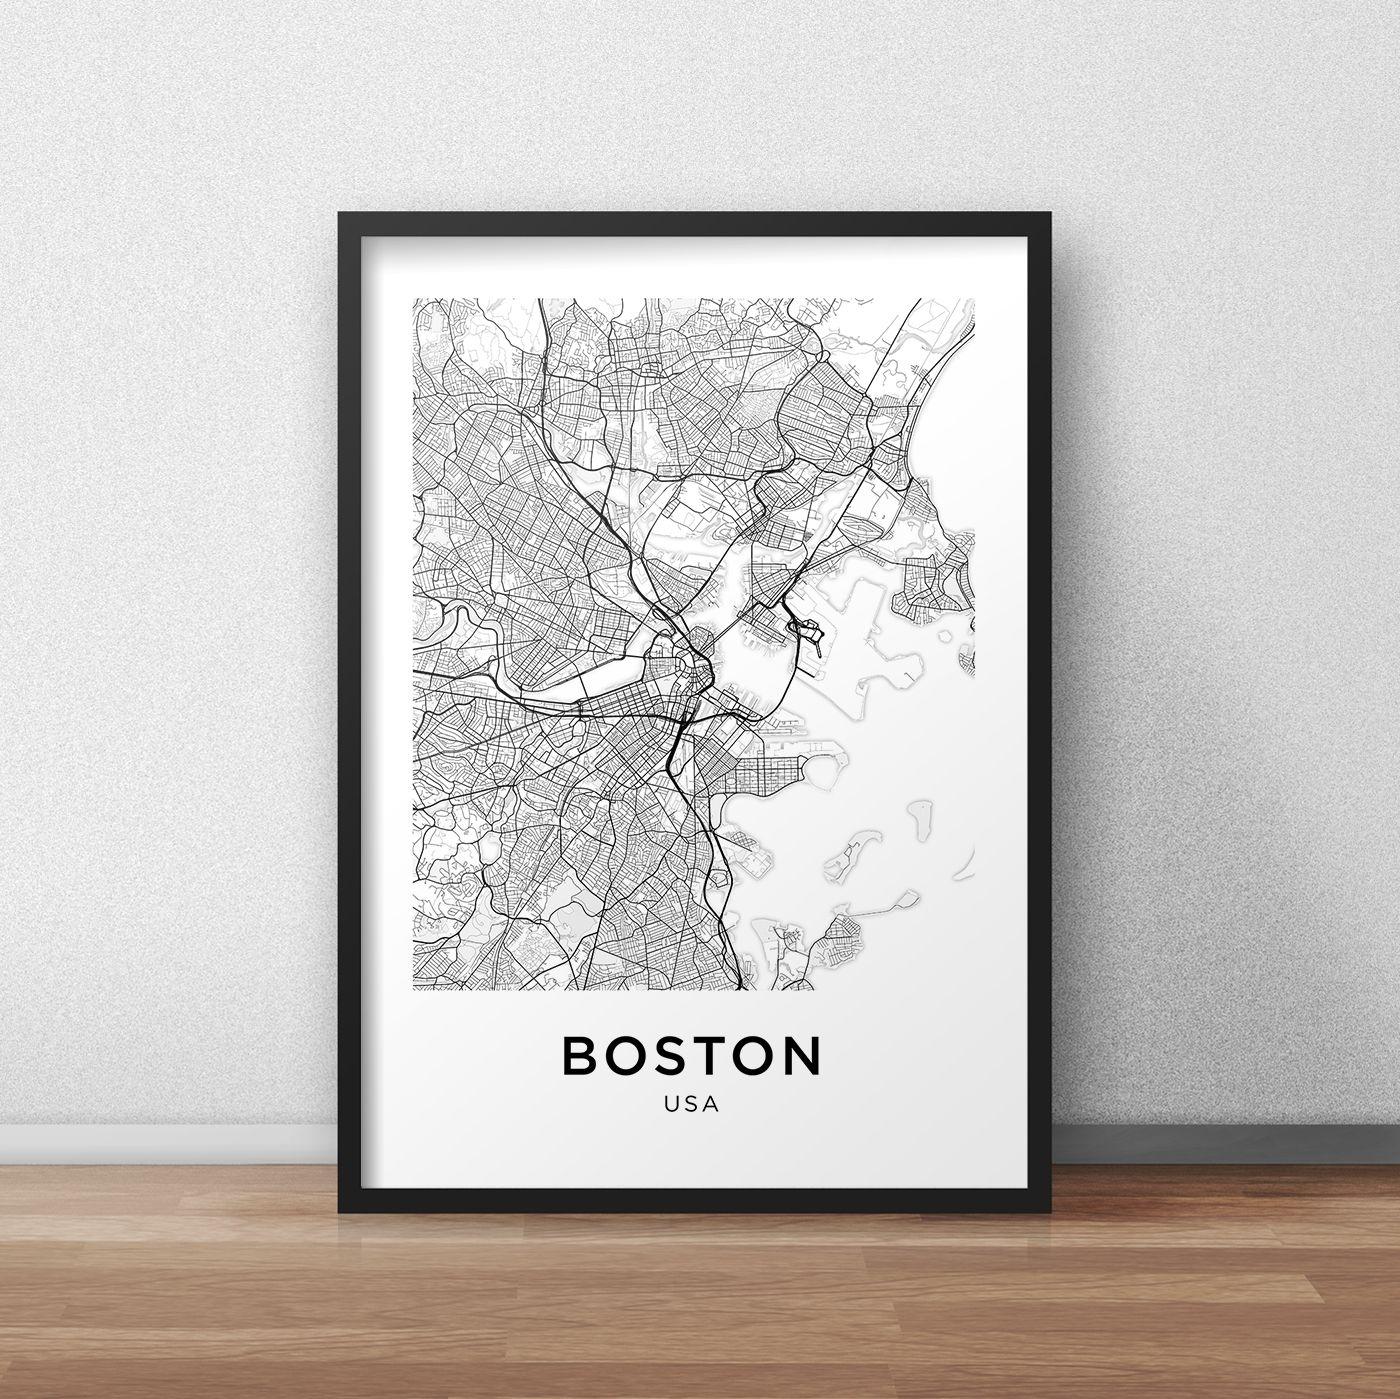 Boston Map Print, Printable Boston Map, Boston City Map, Boston For Most Recent Boston Wall Art (View 7 of 20)